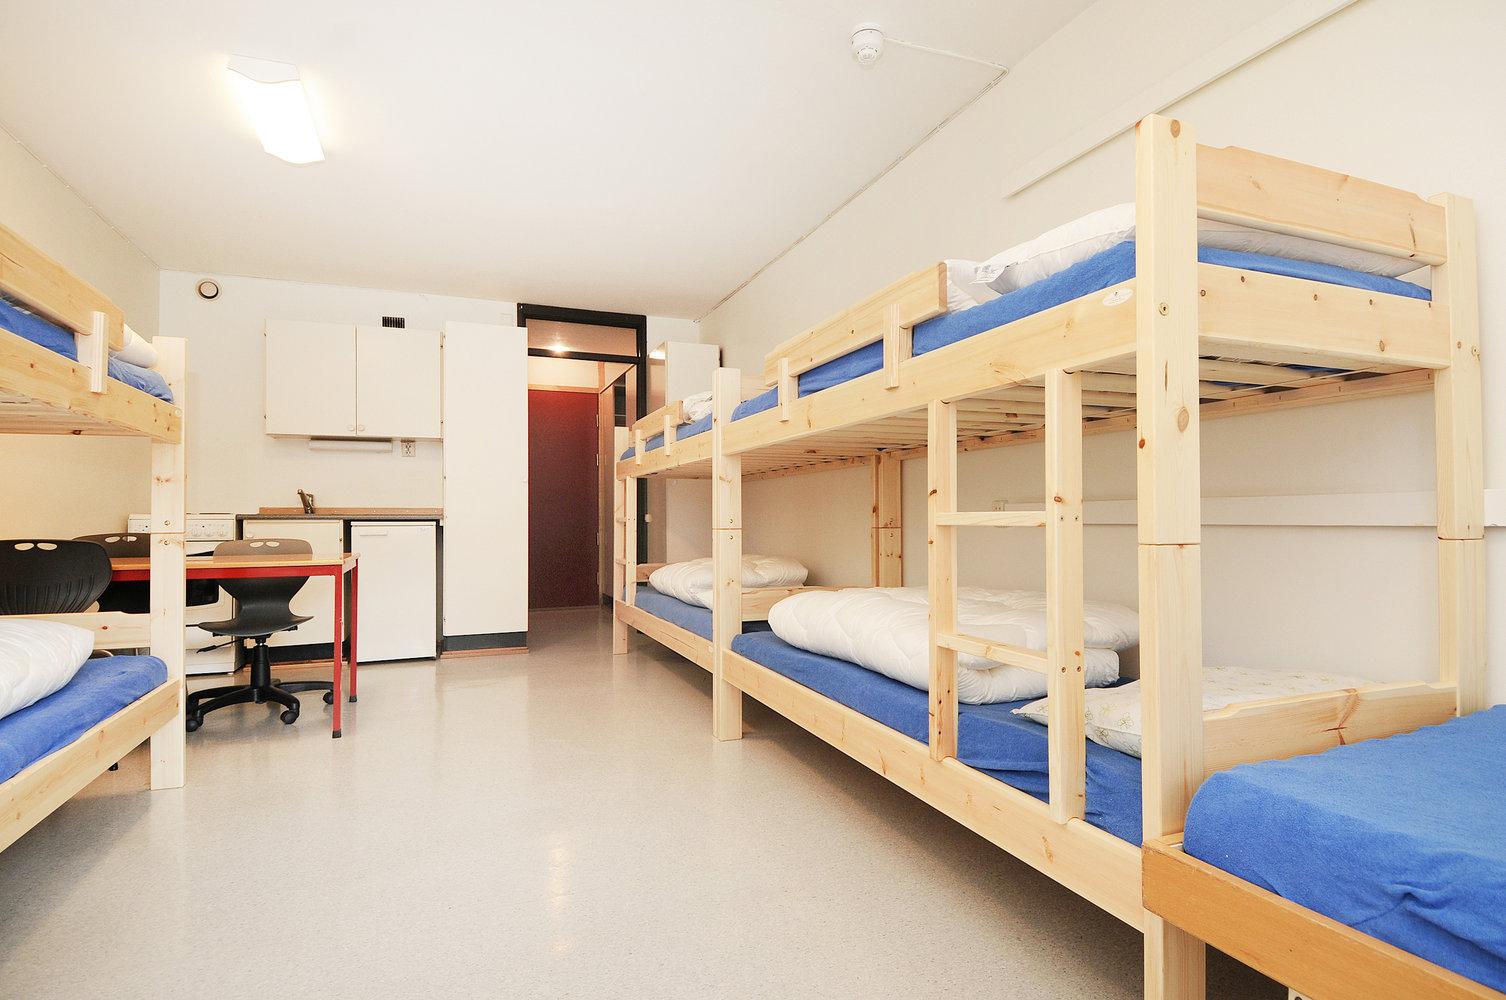 Anker Hostel Oslo Norway Reviews Hostelz Com